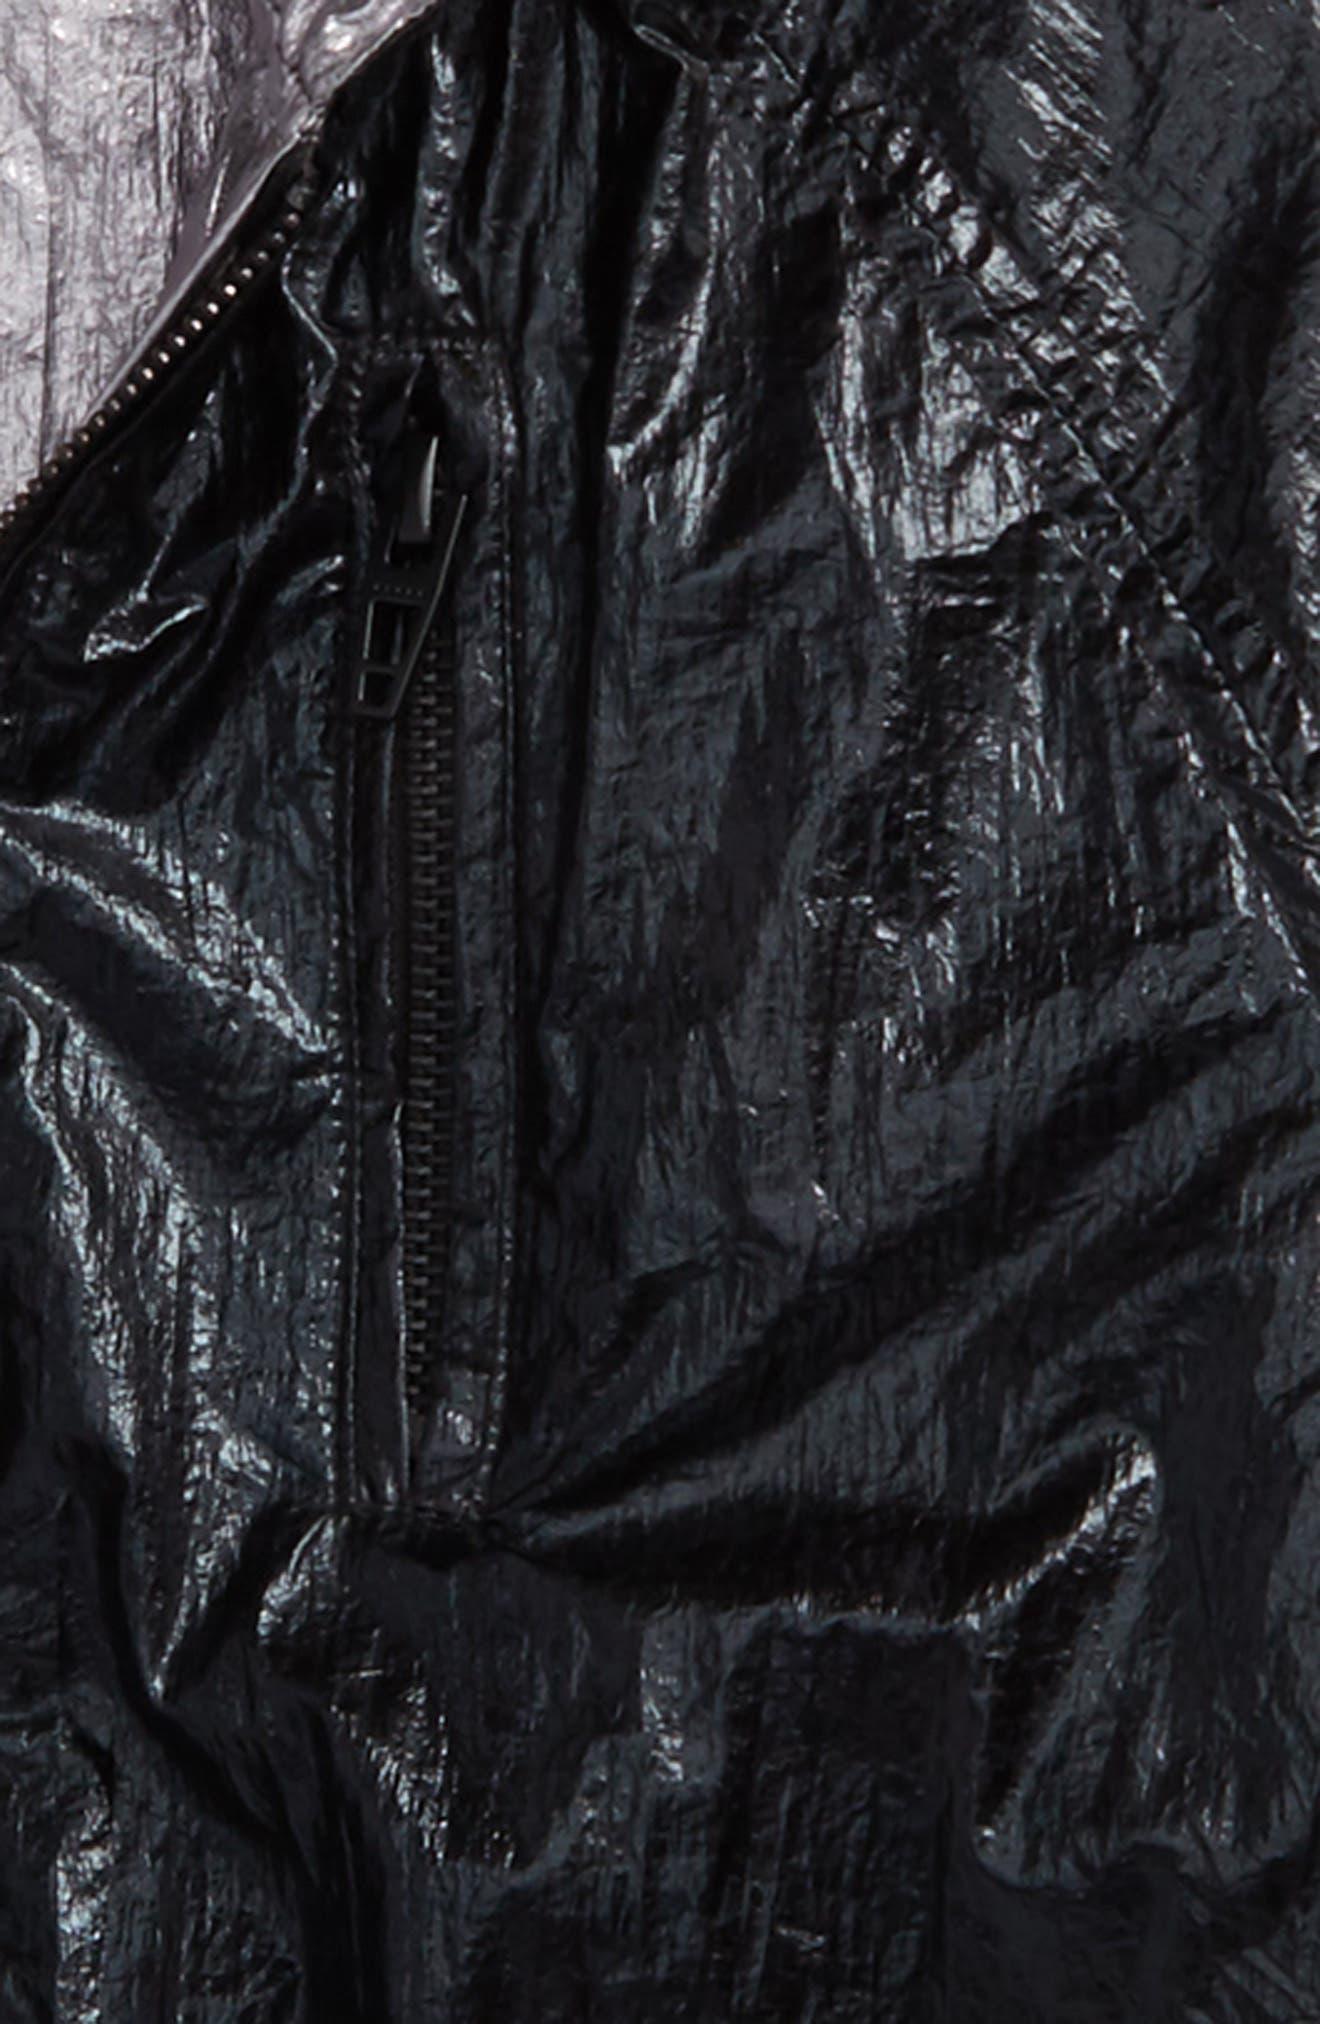 BLANCNYC Good Vibrations Reversible Hooded Jacket,                             Alternate thumbnail 3, color,                             Black/ Silver